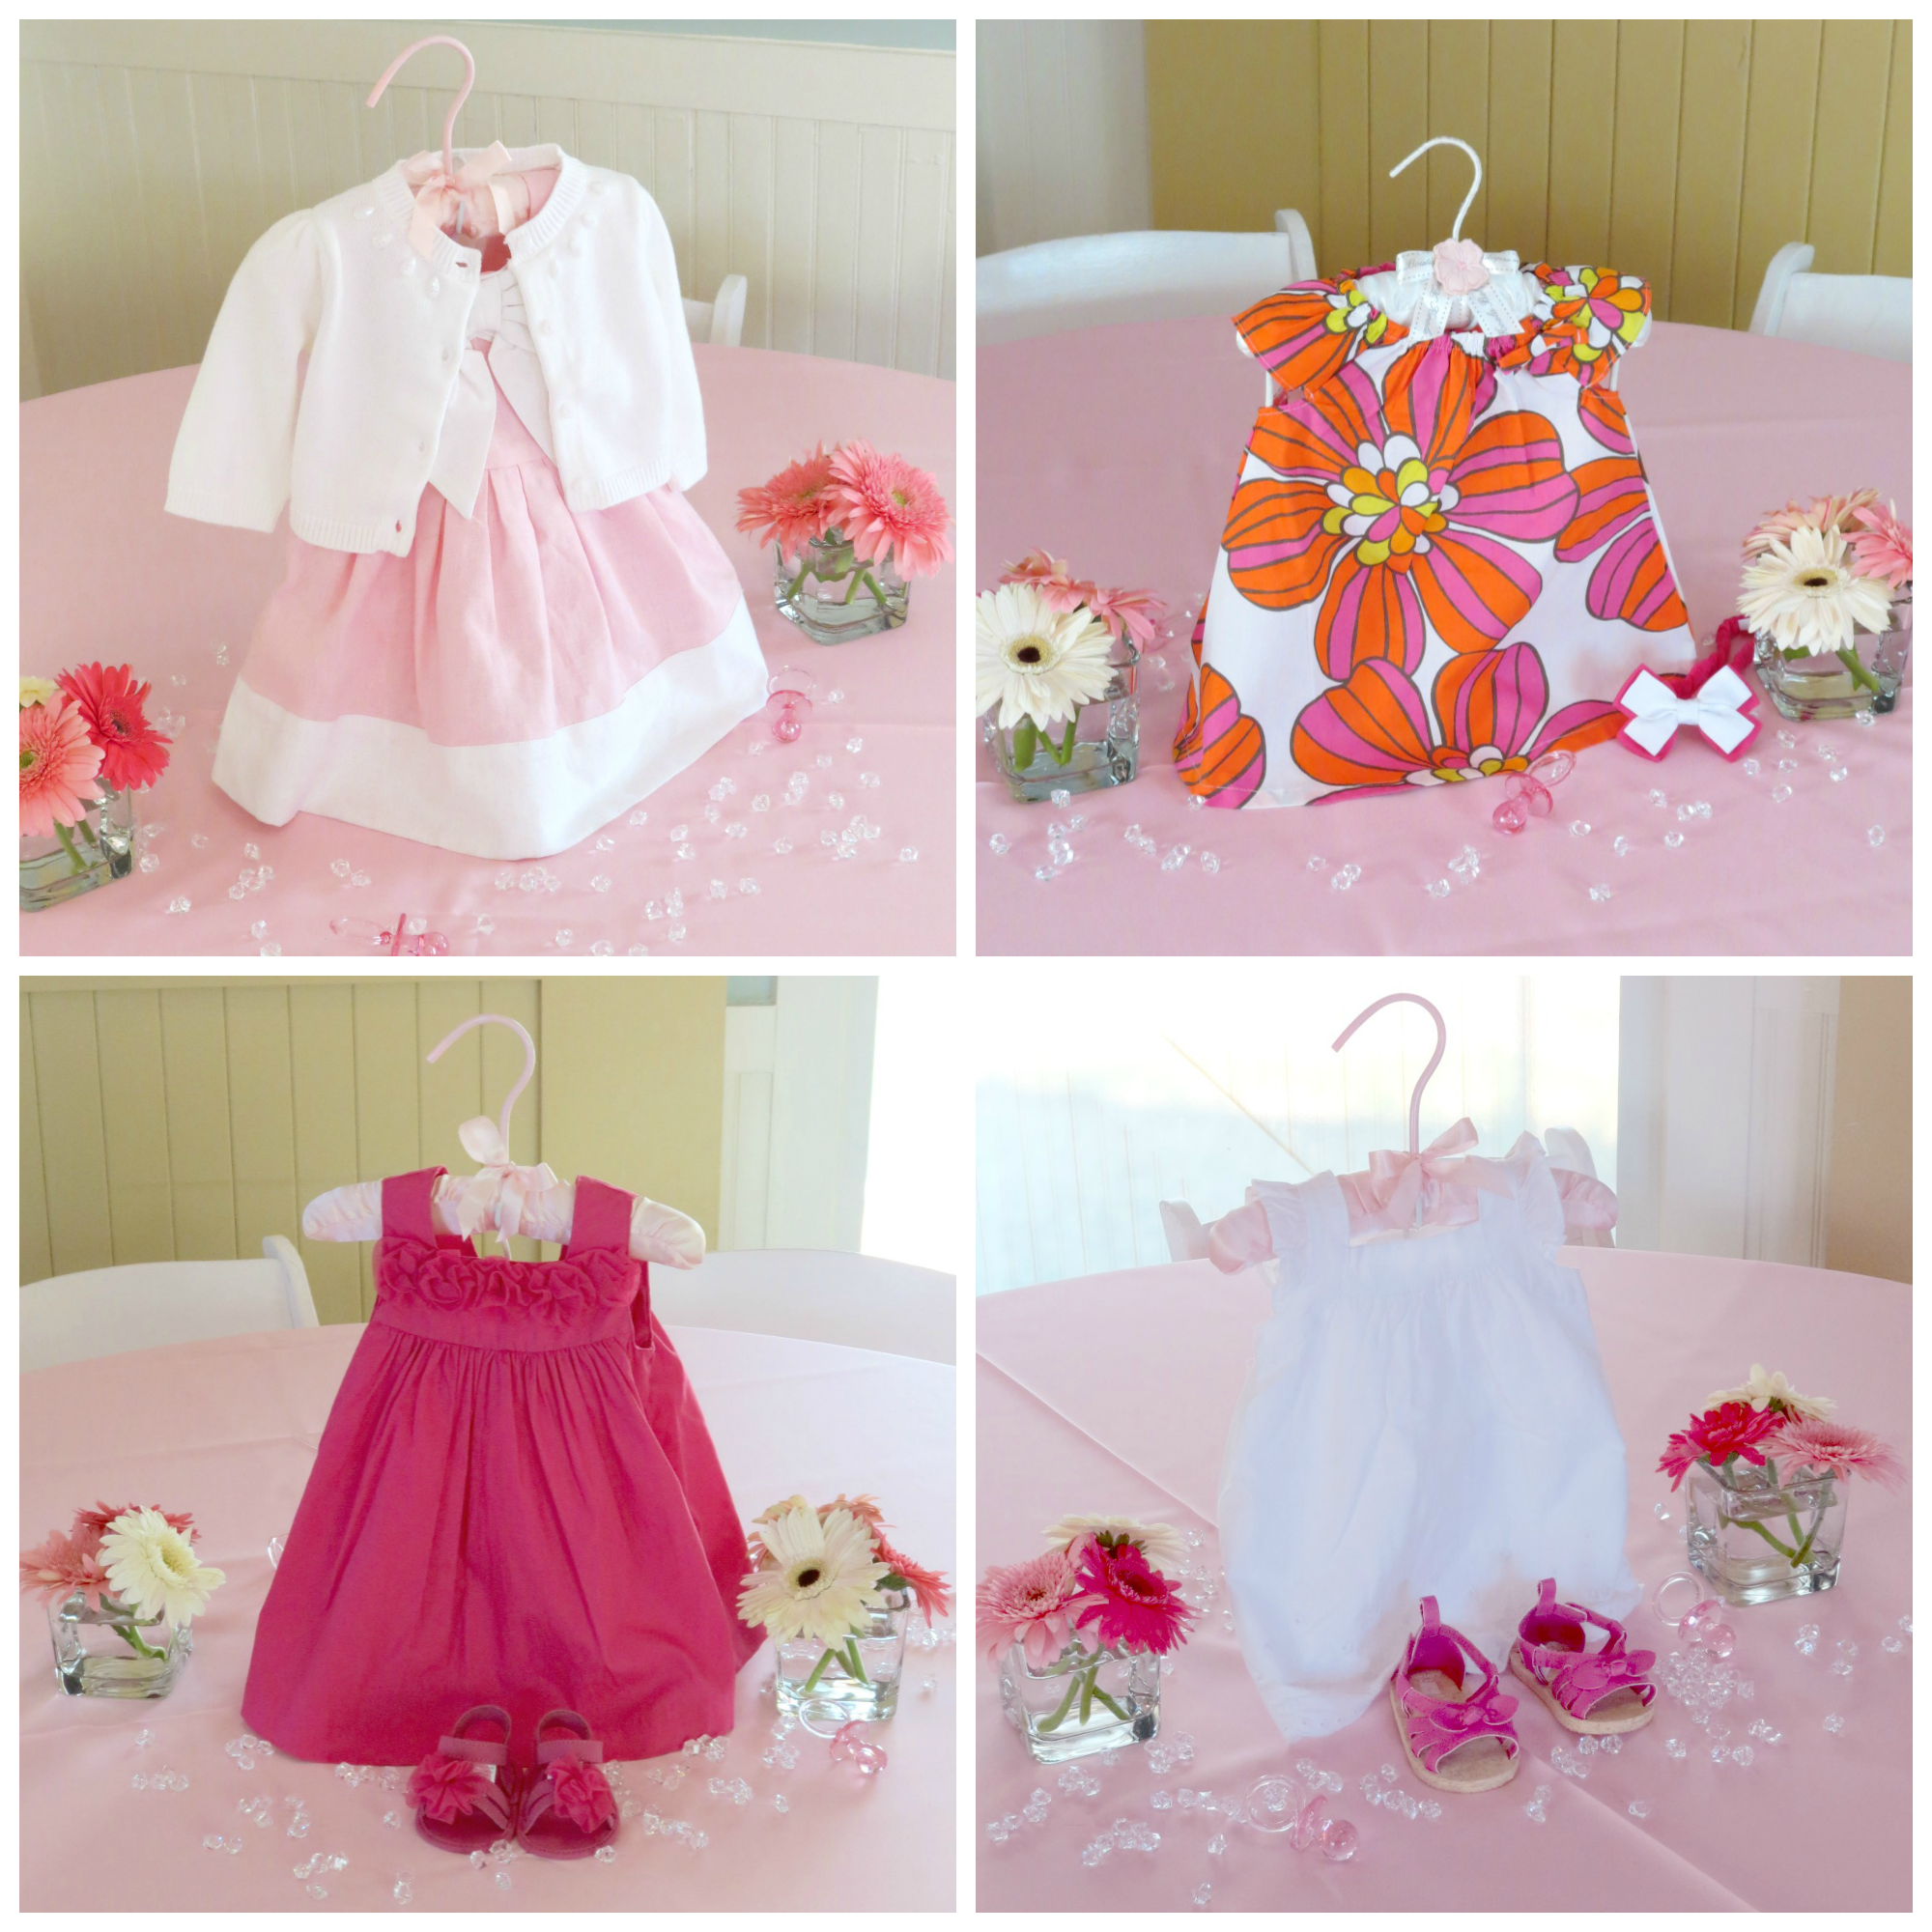 Diy baby dress centerpiece